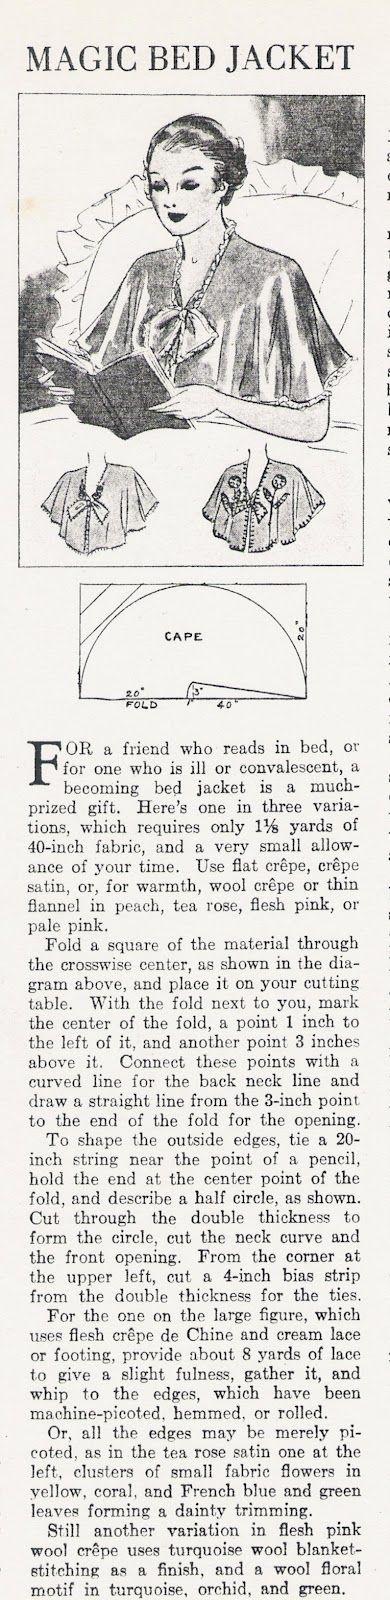 Free Vintage Bed Jacket Sewing Pattern and Tutorial | Scarf ...